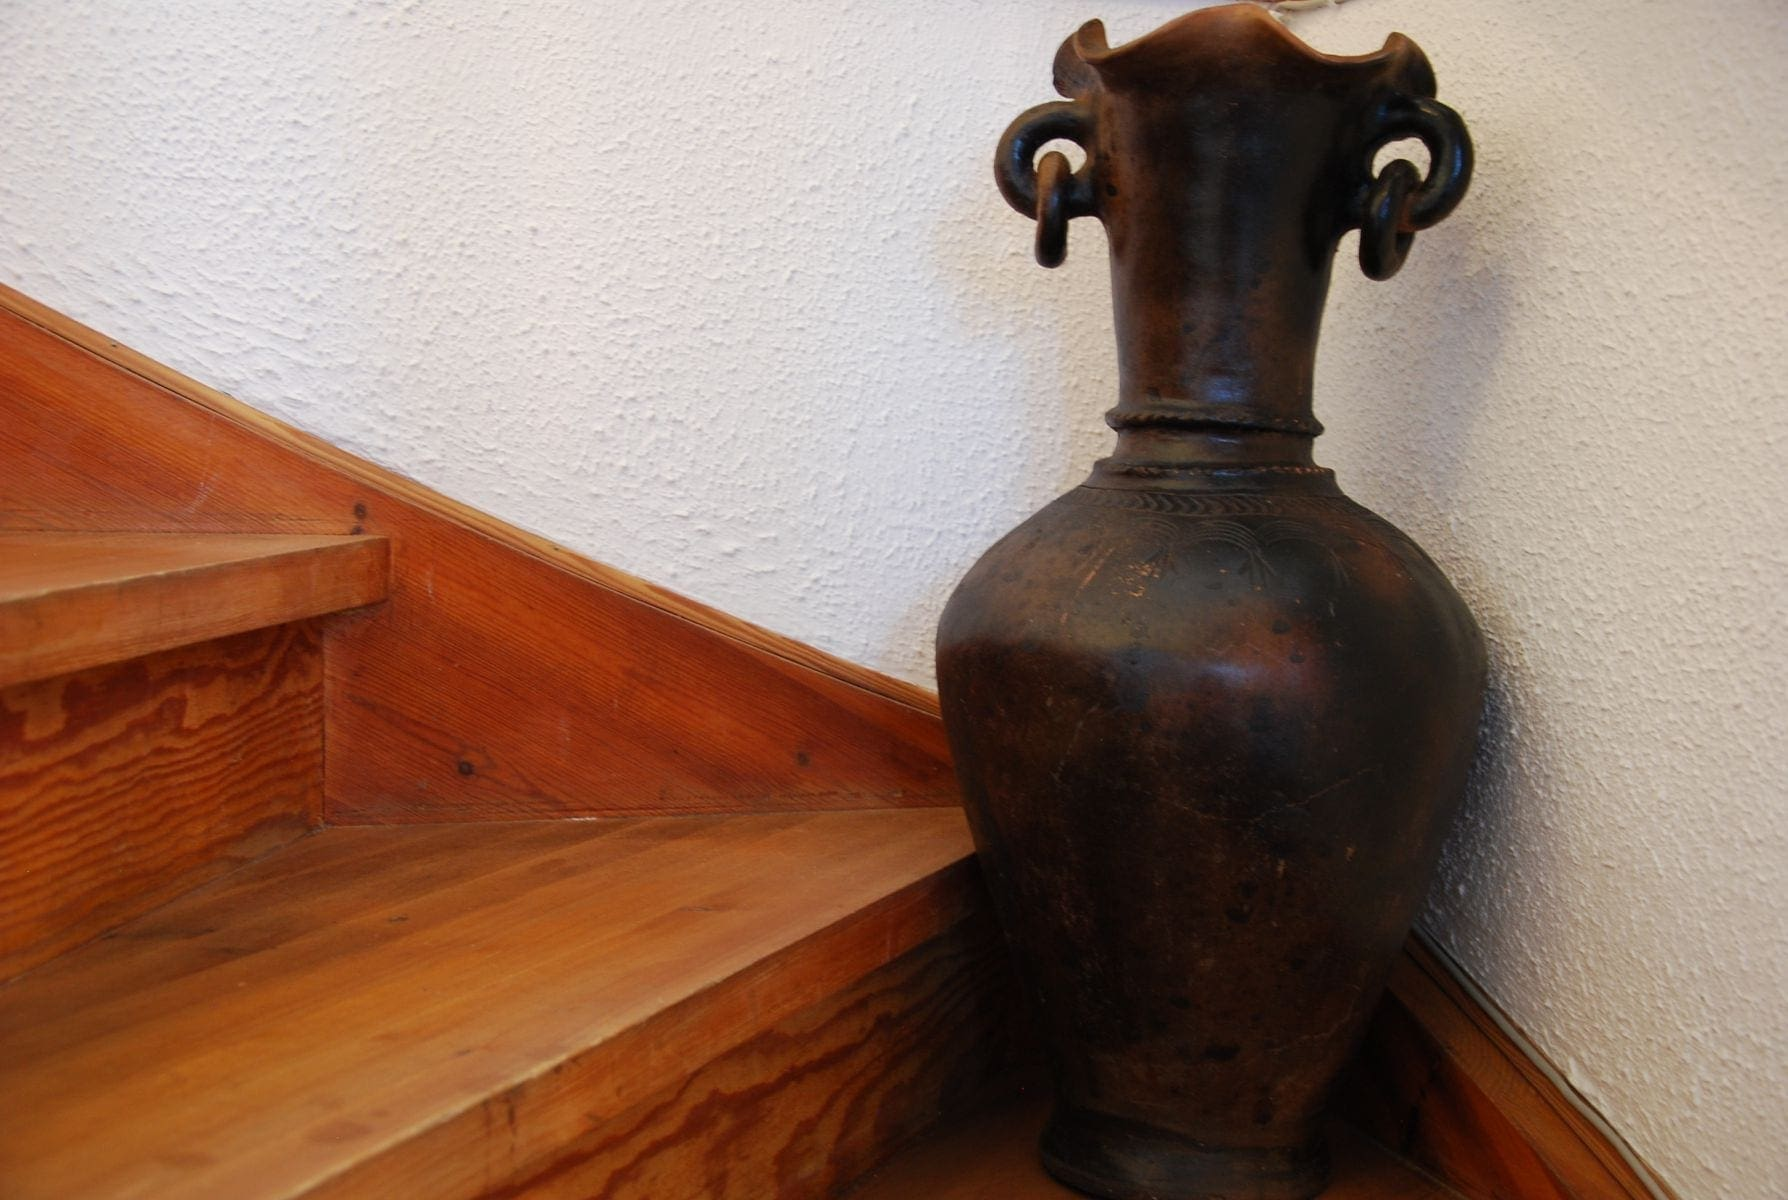 Bau Truc G inredning lerkrus lerkärl interior design vas krukor urnor